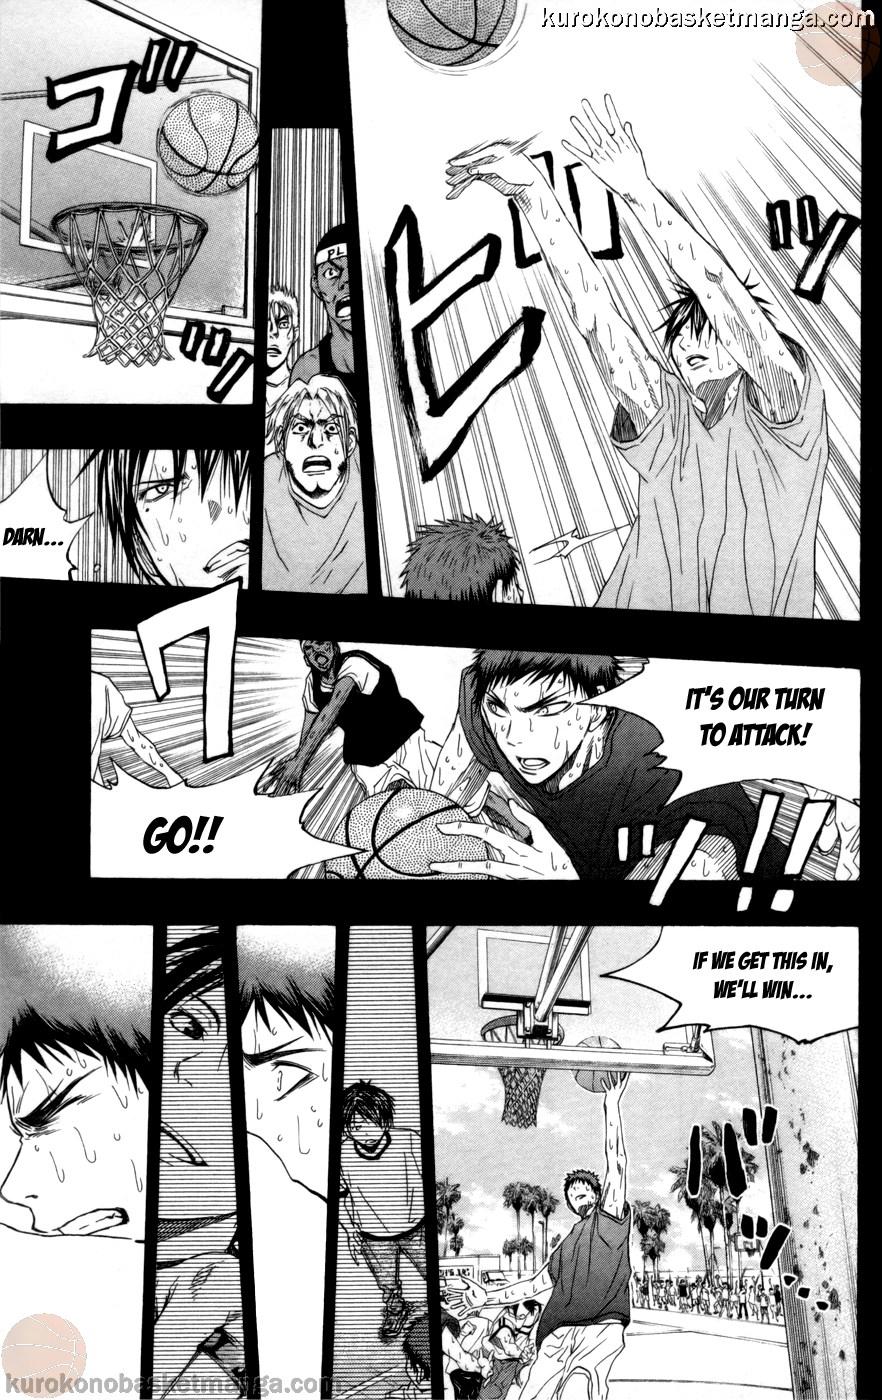 Kuroko no Basket Manga Chapter 76 - Image 15